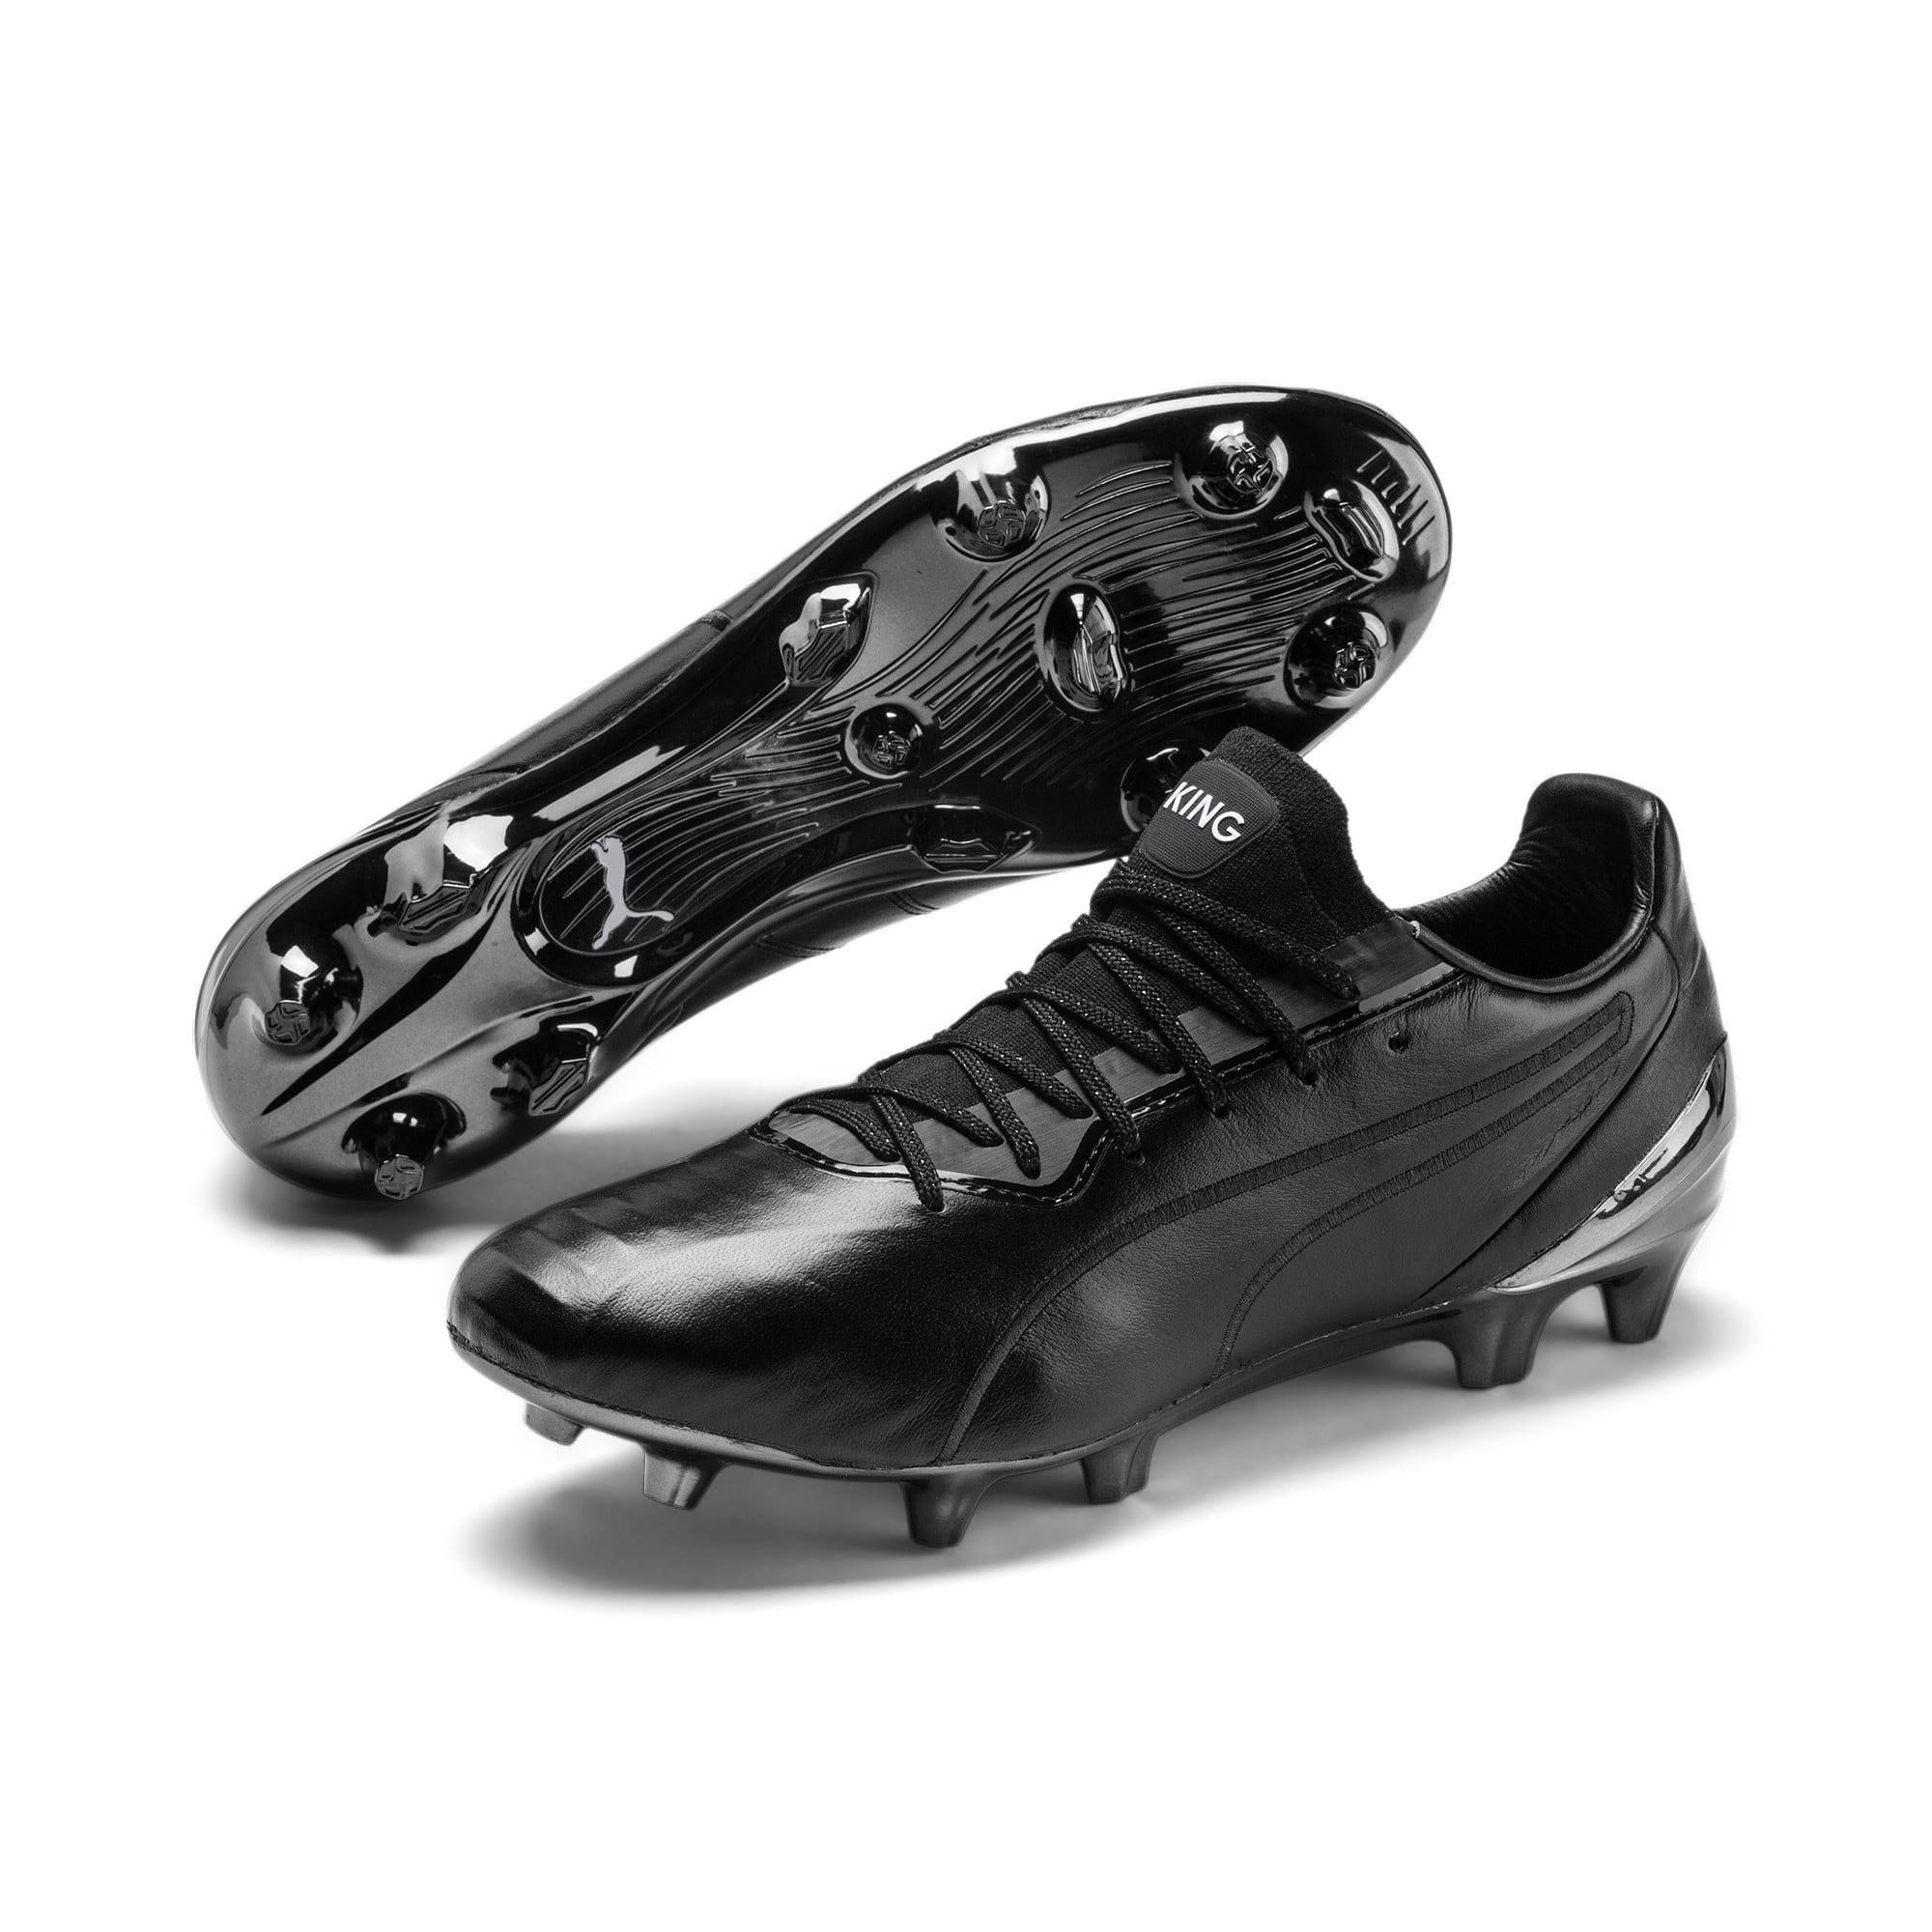 Thumbnail 3 of King Platinum FG/AG Men's Soccer Cleats, Puma Black-Puma White, medium